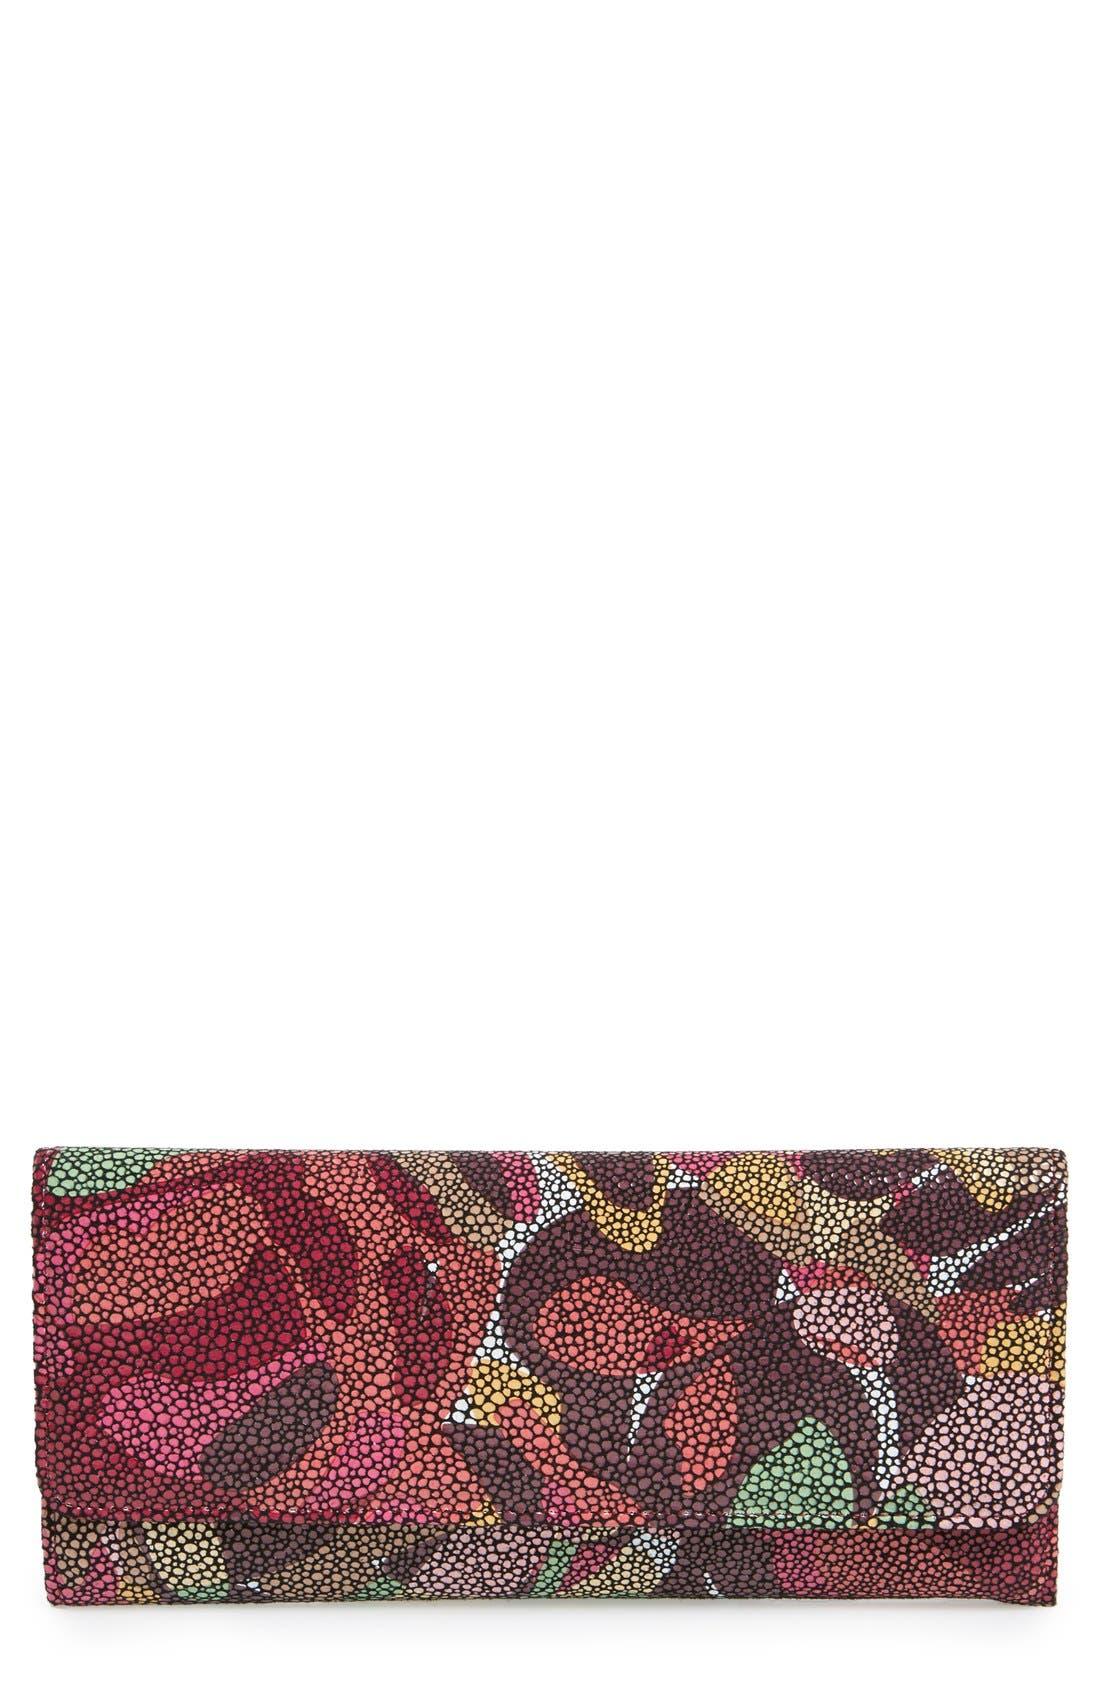 'Sadie' Leather Wallet,                             Main thumbnail 57, color,